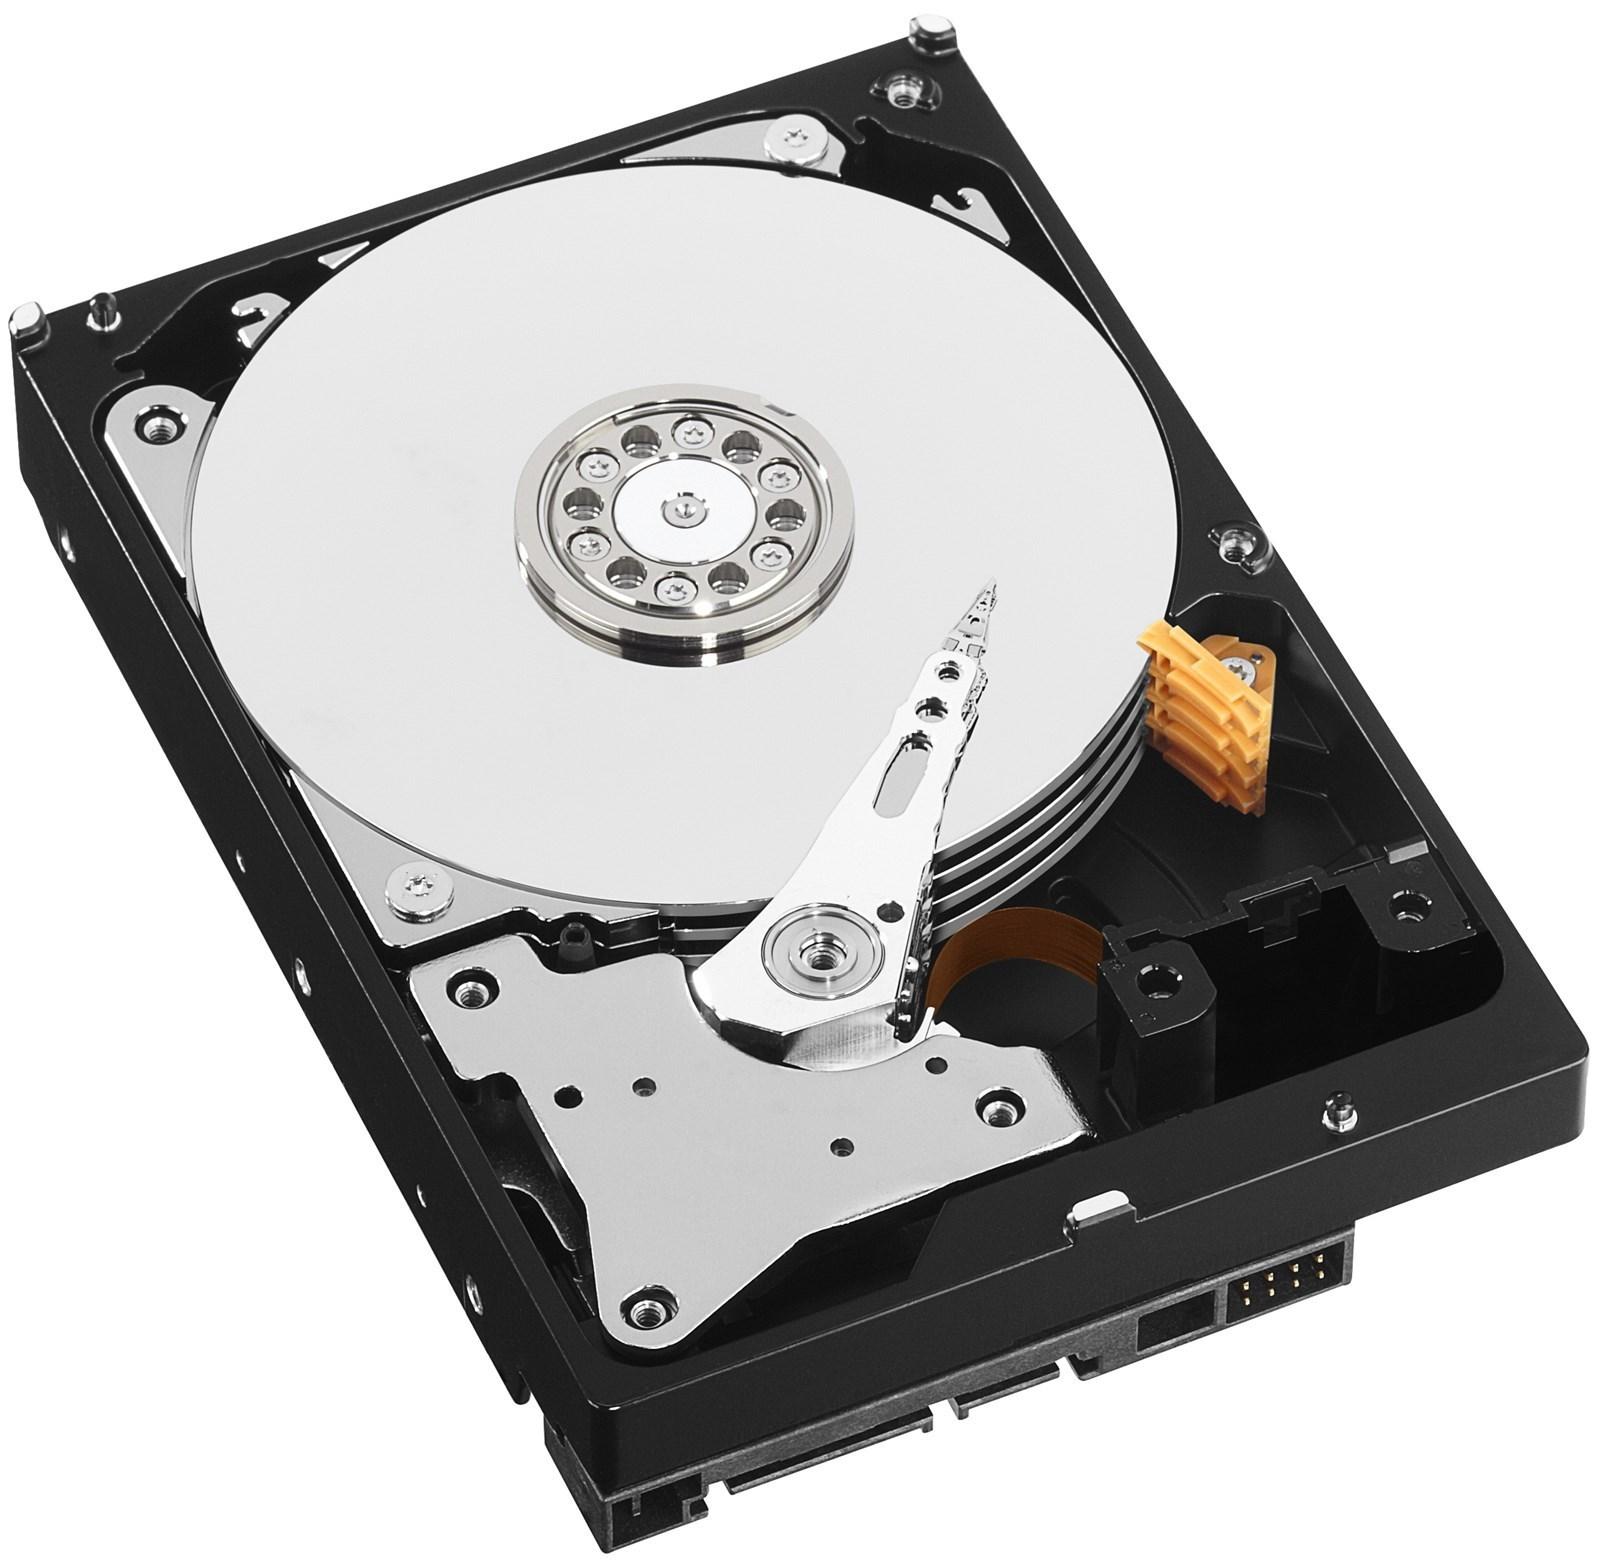 Western Digital Purple Wd05purx 500g 35 Sata 60gb S Hard Drive Disk Selector